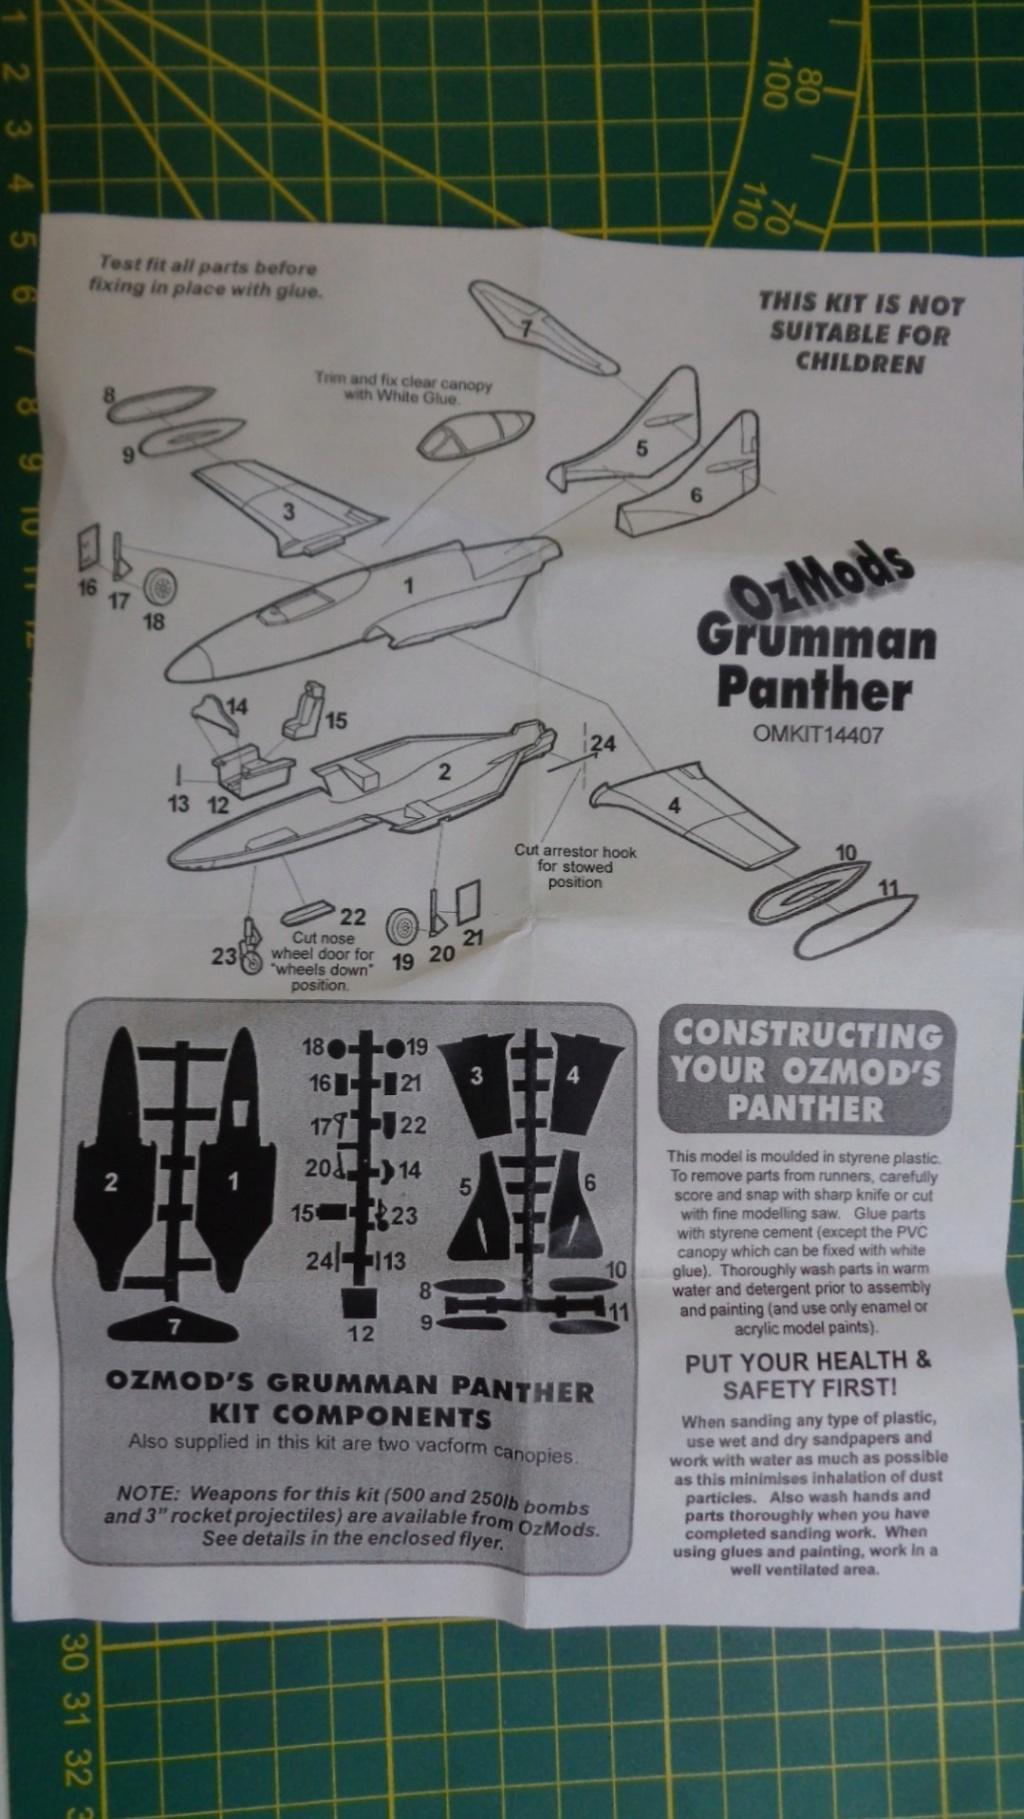 [OZ MODS] GRUMMAN F 9 F PANTHER Réf OMKIT 14407 1/144ème Dsc05019